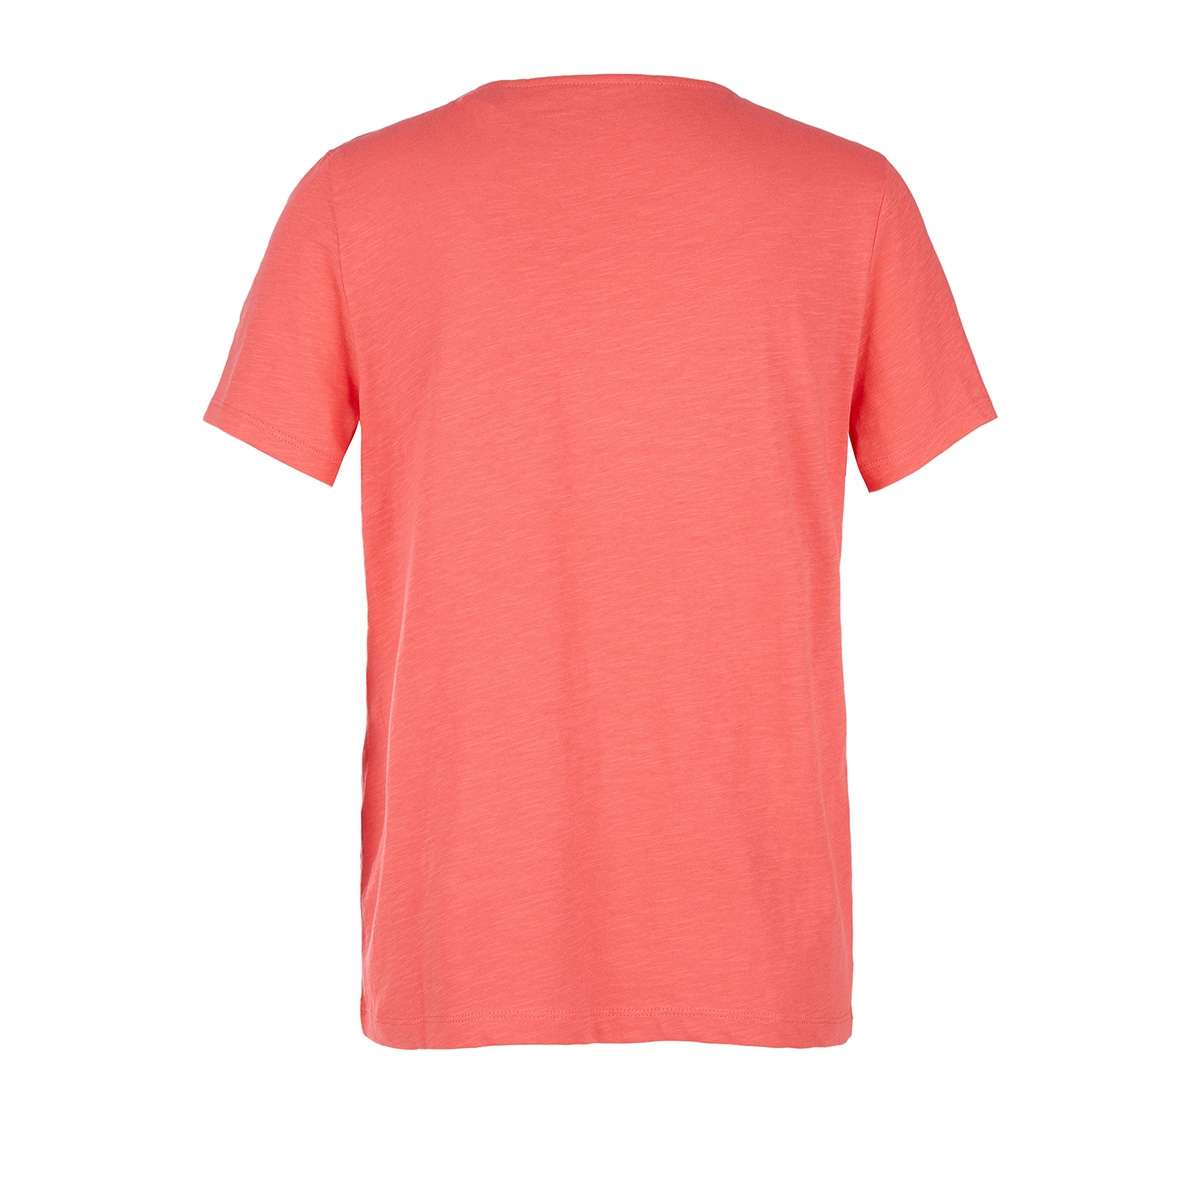 t shirt 14005325021 s.oliver t-shirt 4510